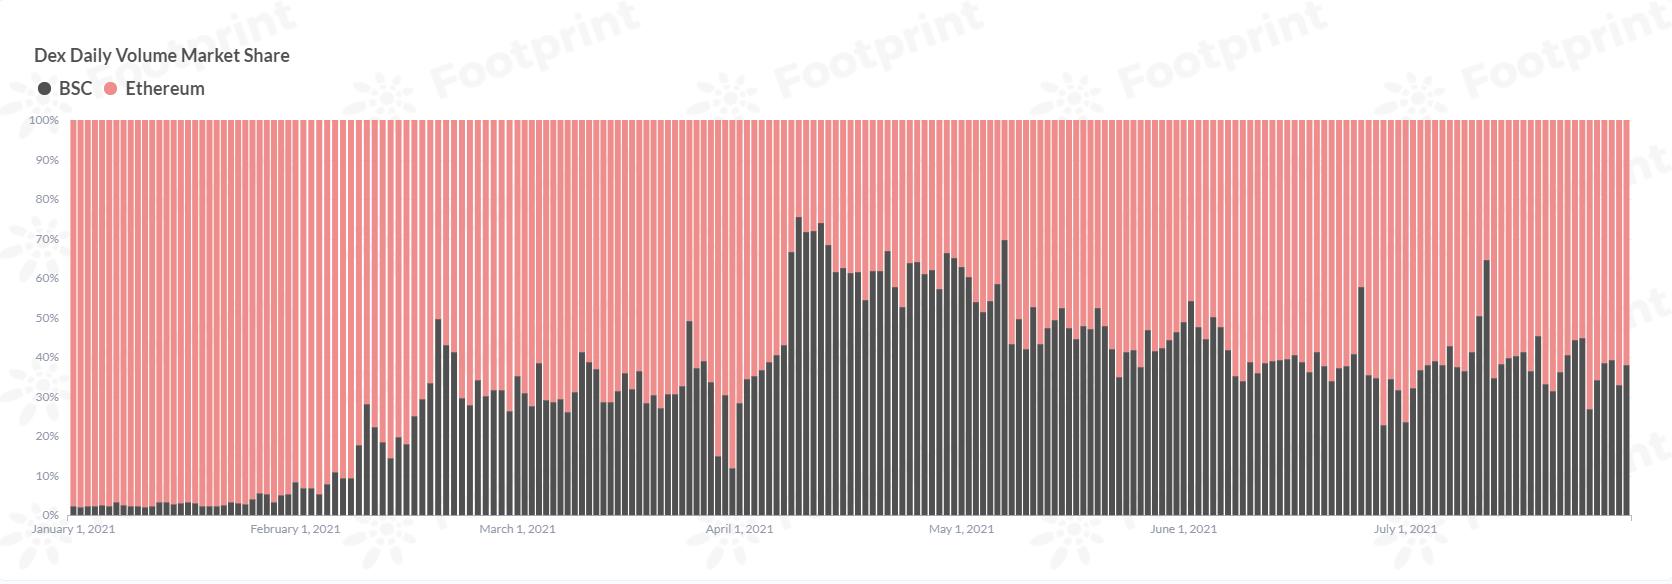 Dex cross-chain daily transaction volume market share (since January 2021) Data source: Footprint